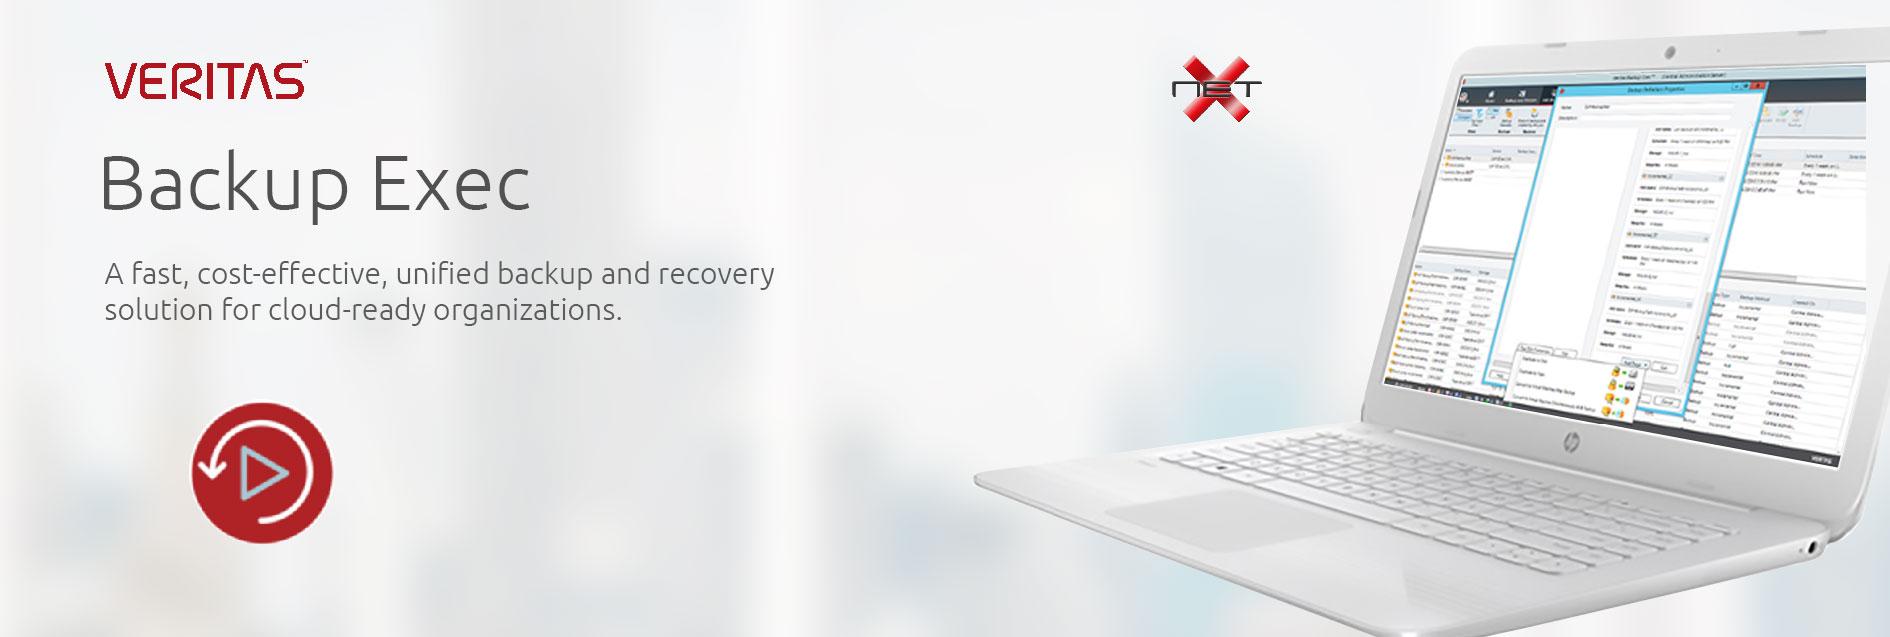 Veritas Backup Exec Services with NetX